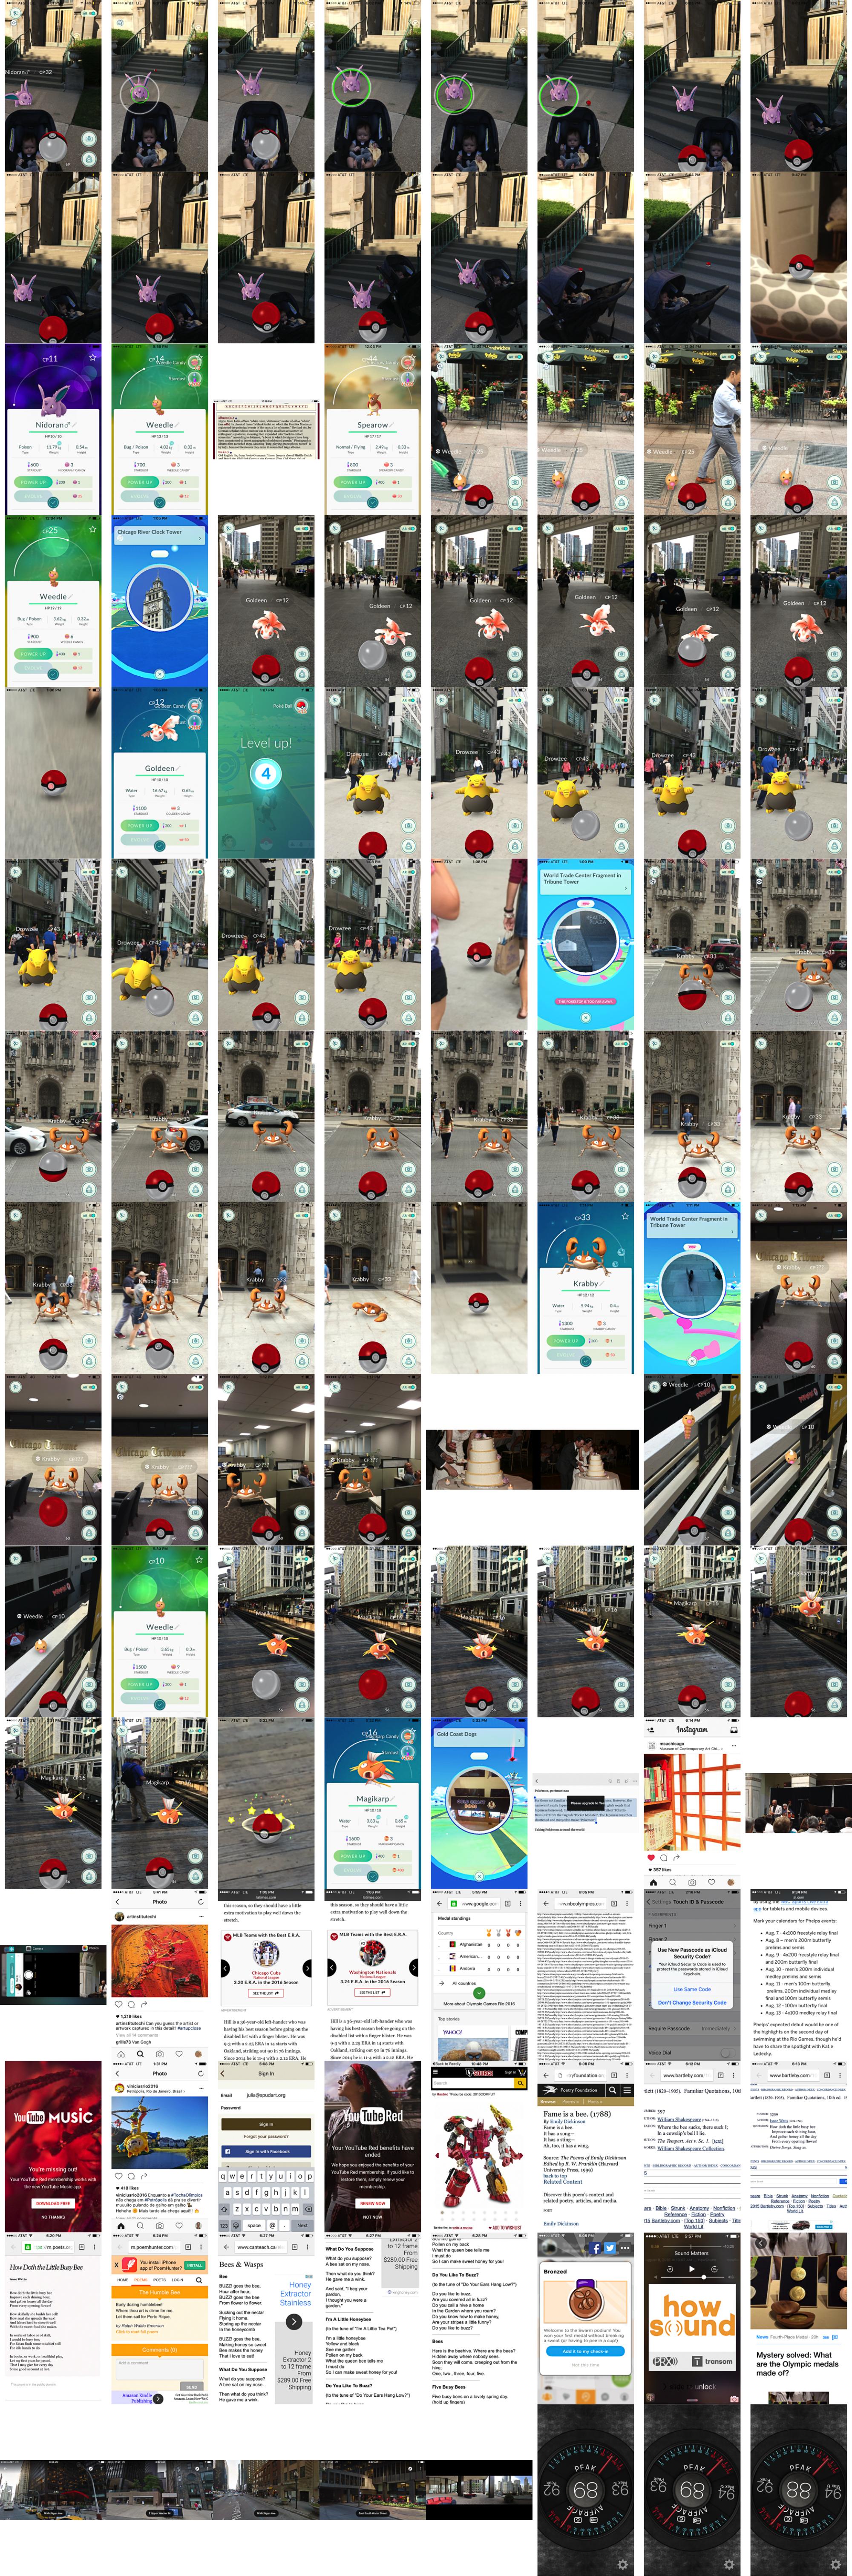 how to make screenshot on iphone 5